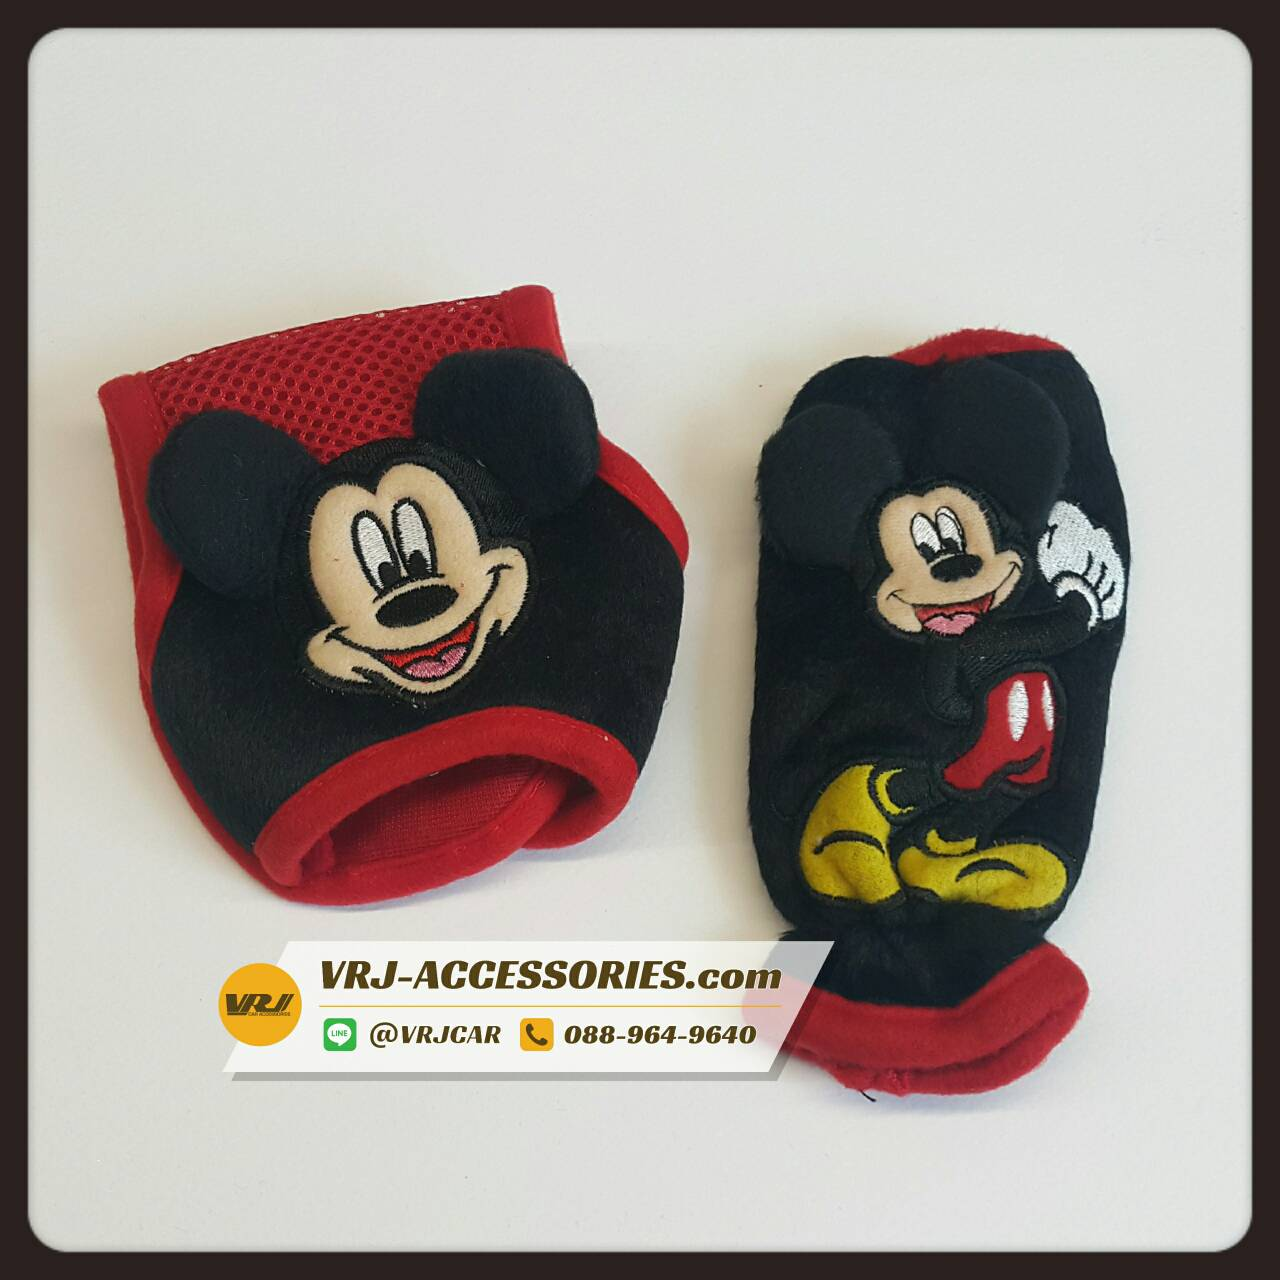 Mickey Mouse ชุดเซตหุ้มเกียร์ ออโต้ และ หุ้มเบรคมือ มิกกี้เม้าส์ ตีกอล์ฟ Knob cover and Hand brake cover